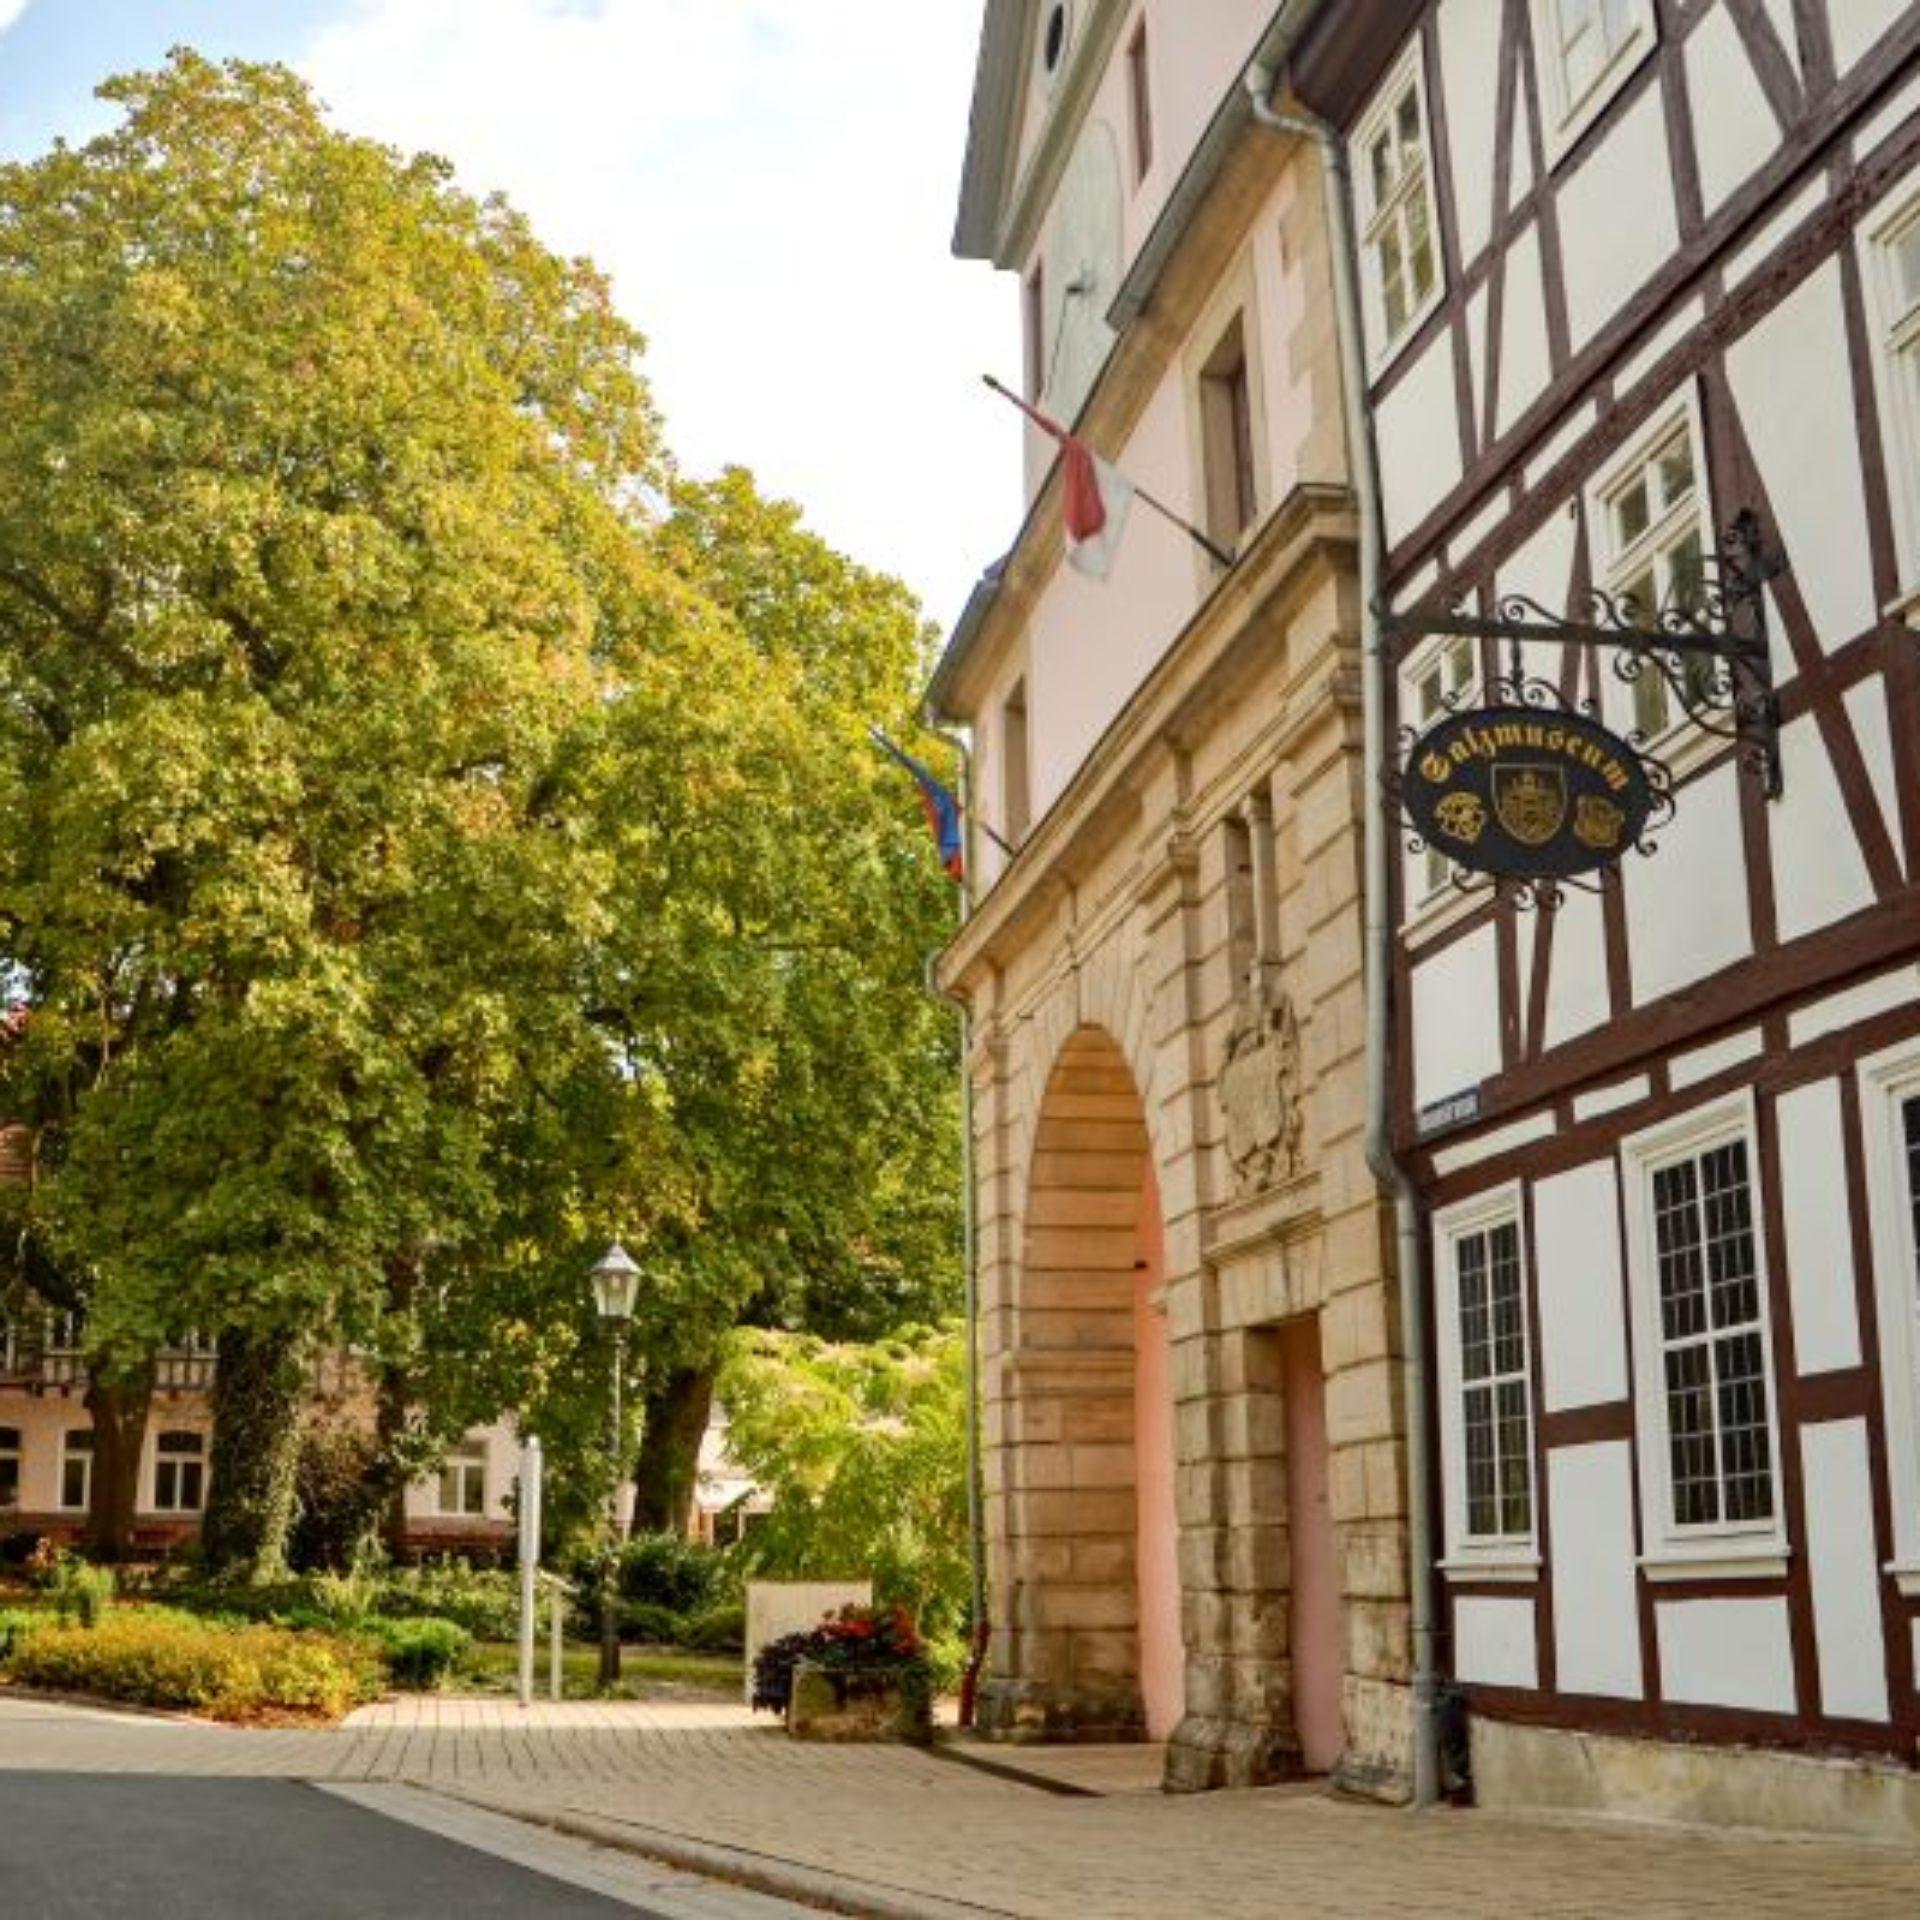 Salzmuseum Bad Sooden-Allendorf